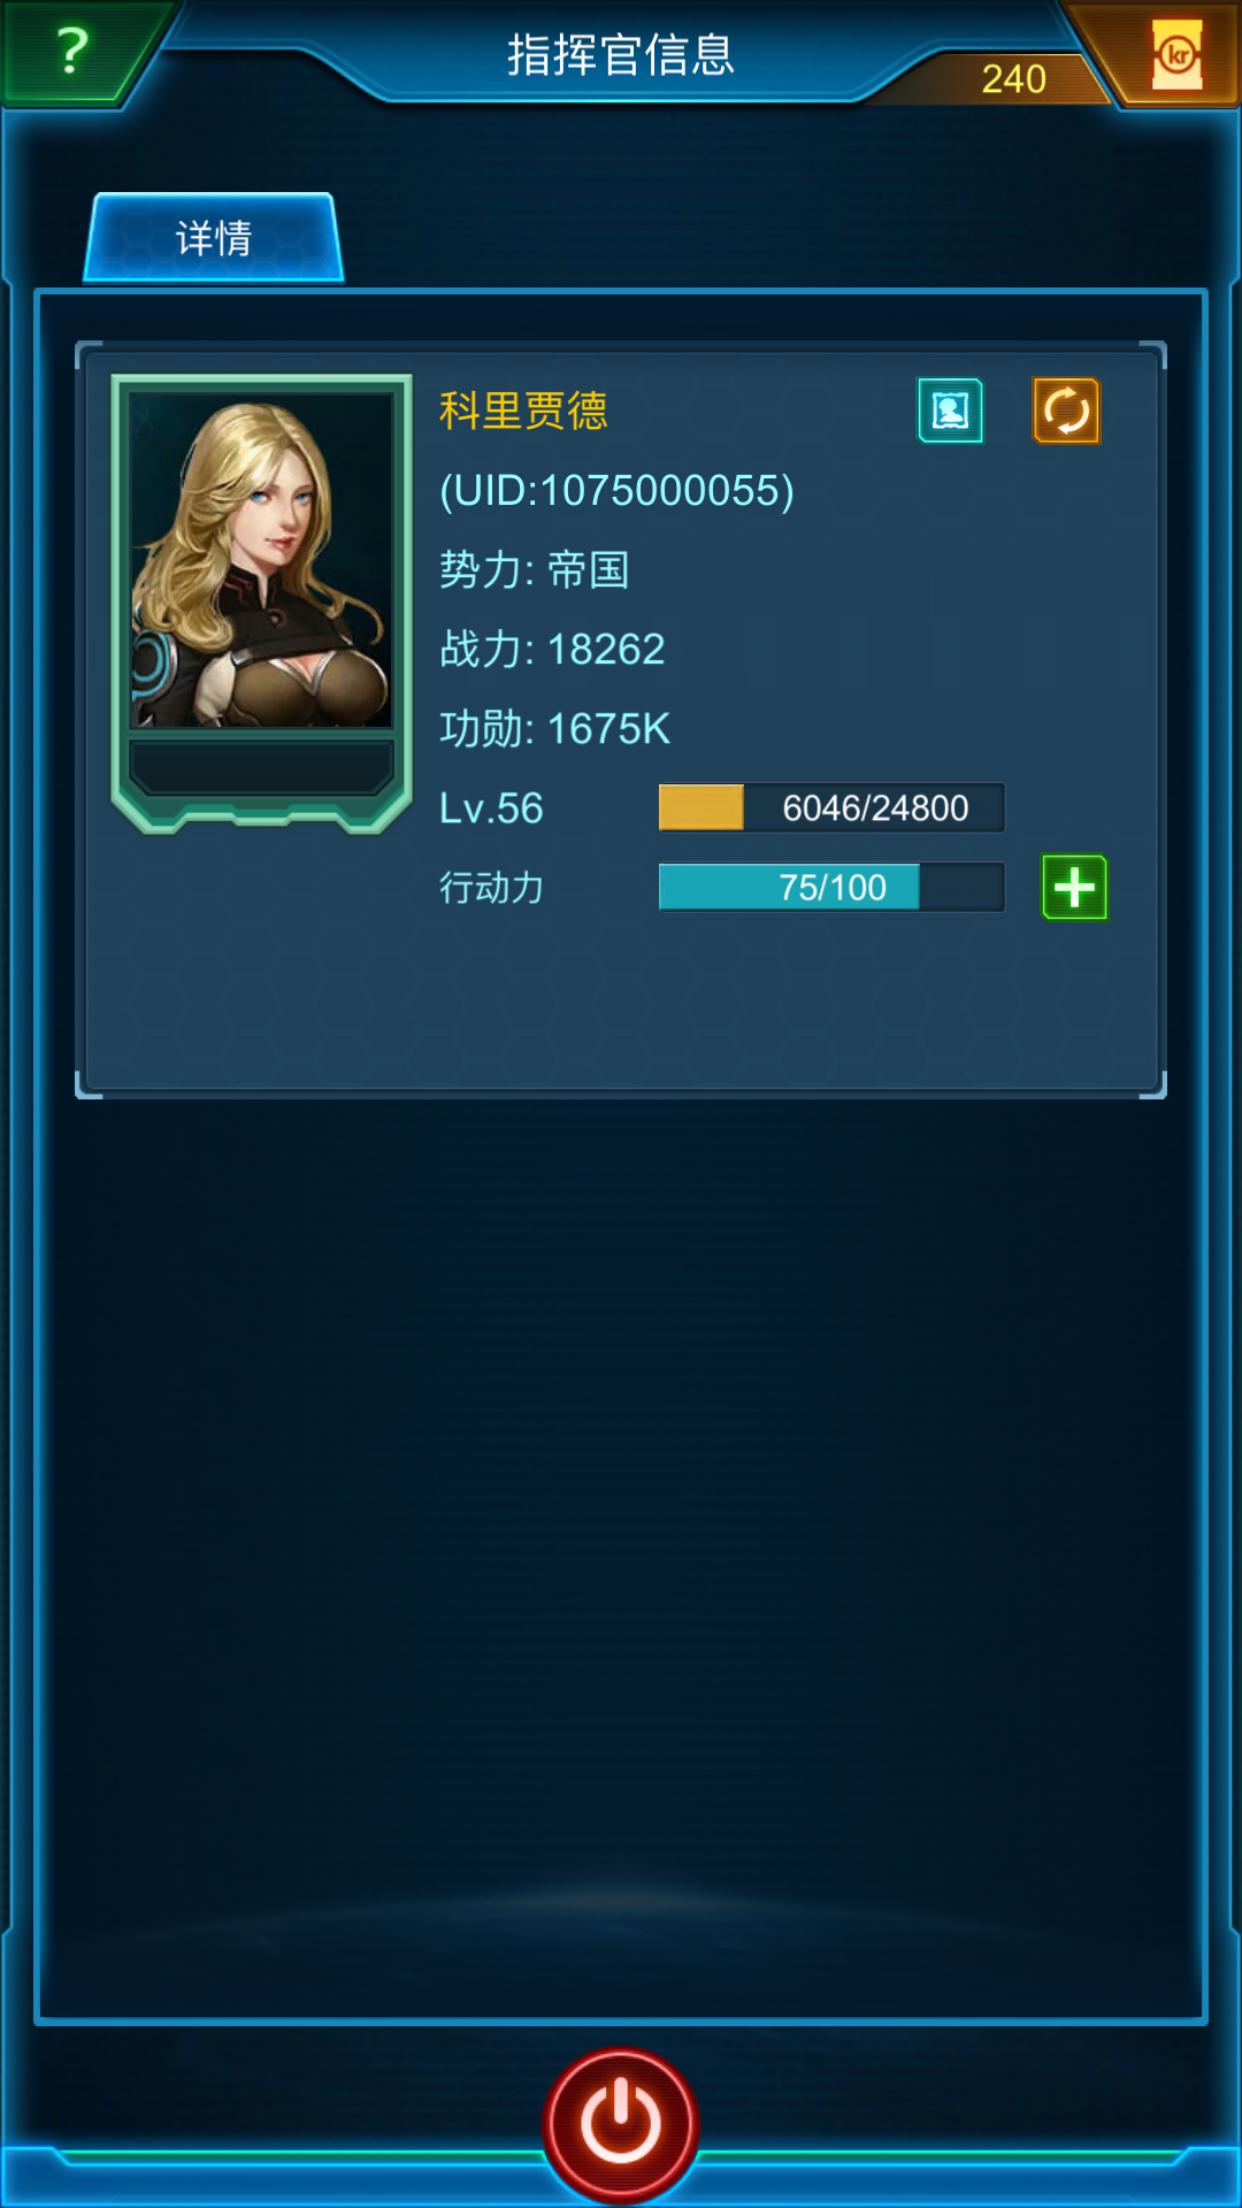 6BB60546-D3E4-46B4-9420-6403167E8D77.png